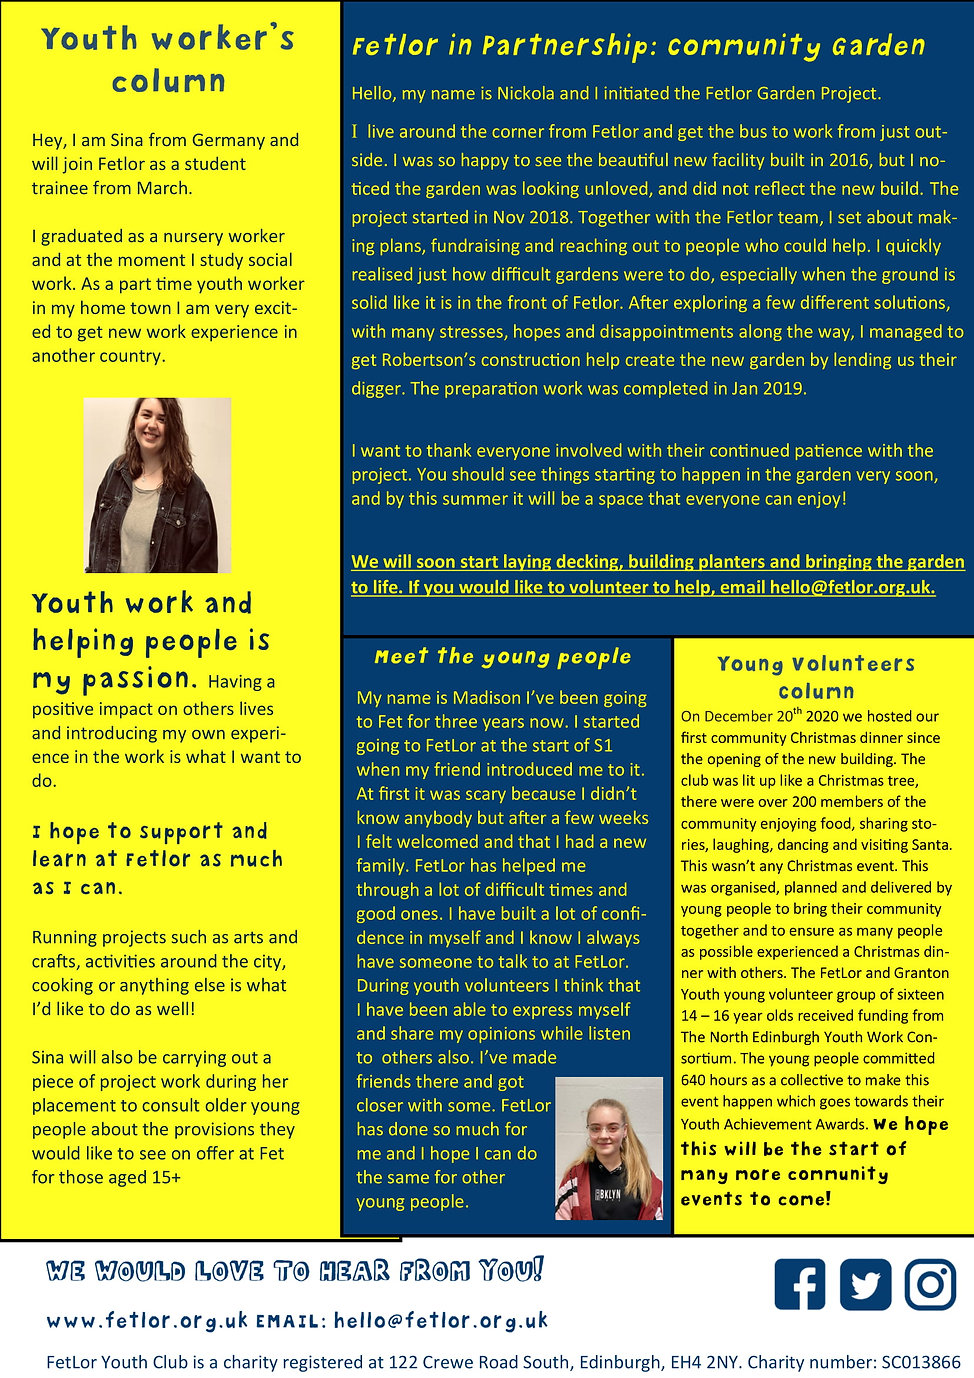 FetLor Youth Club Winter Newsletter 2020